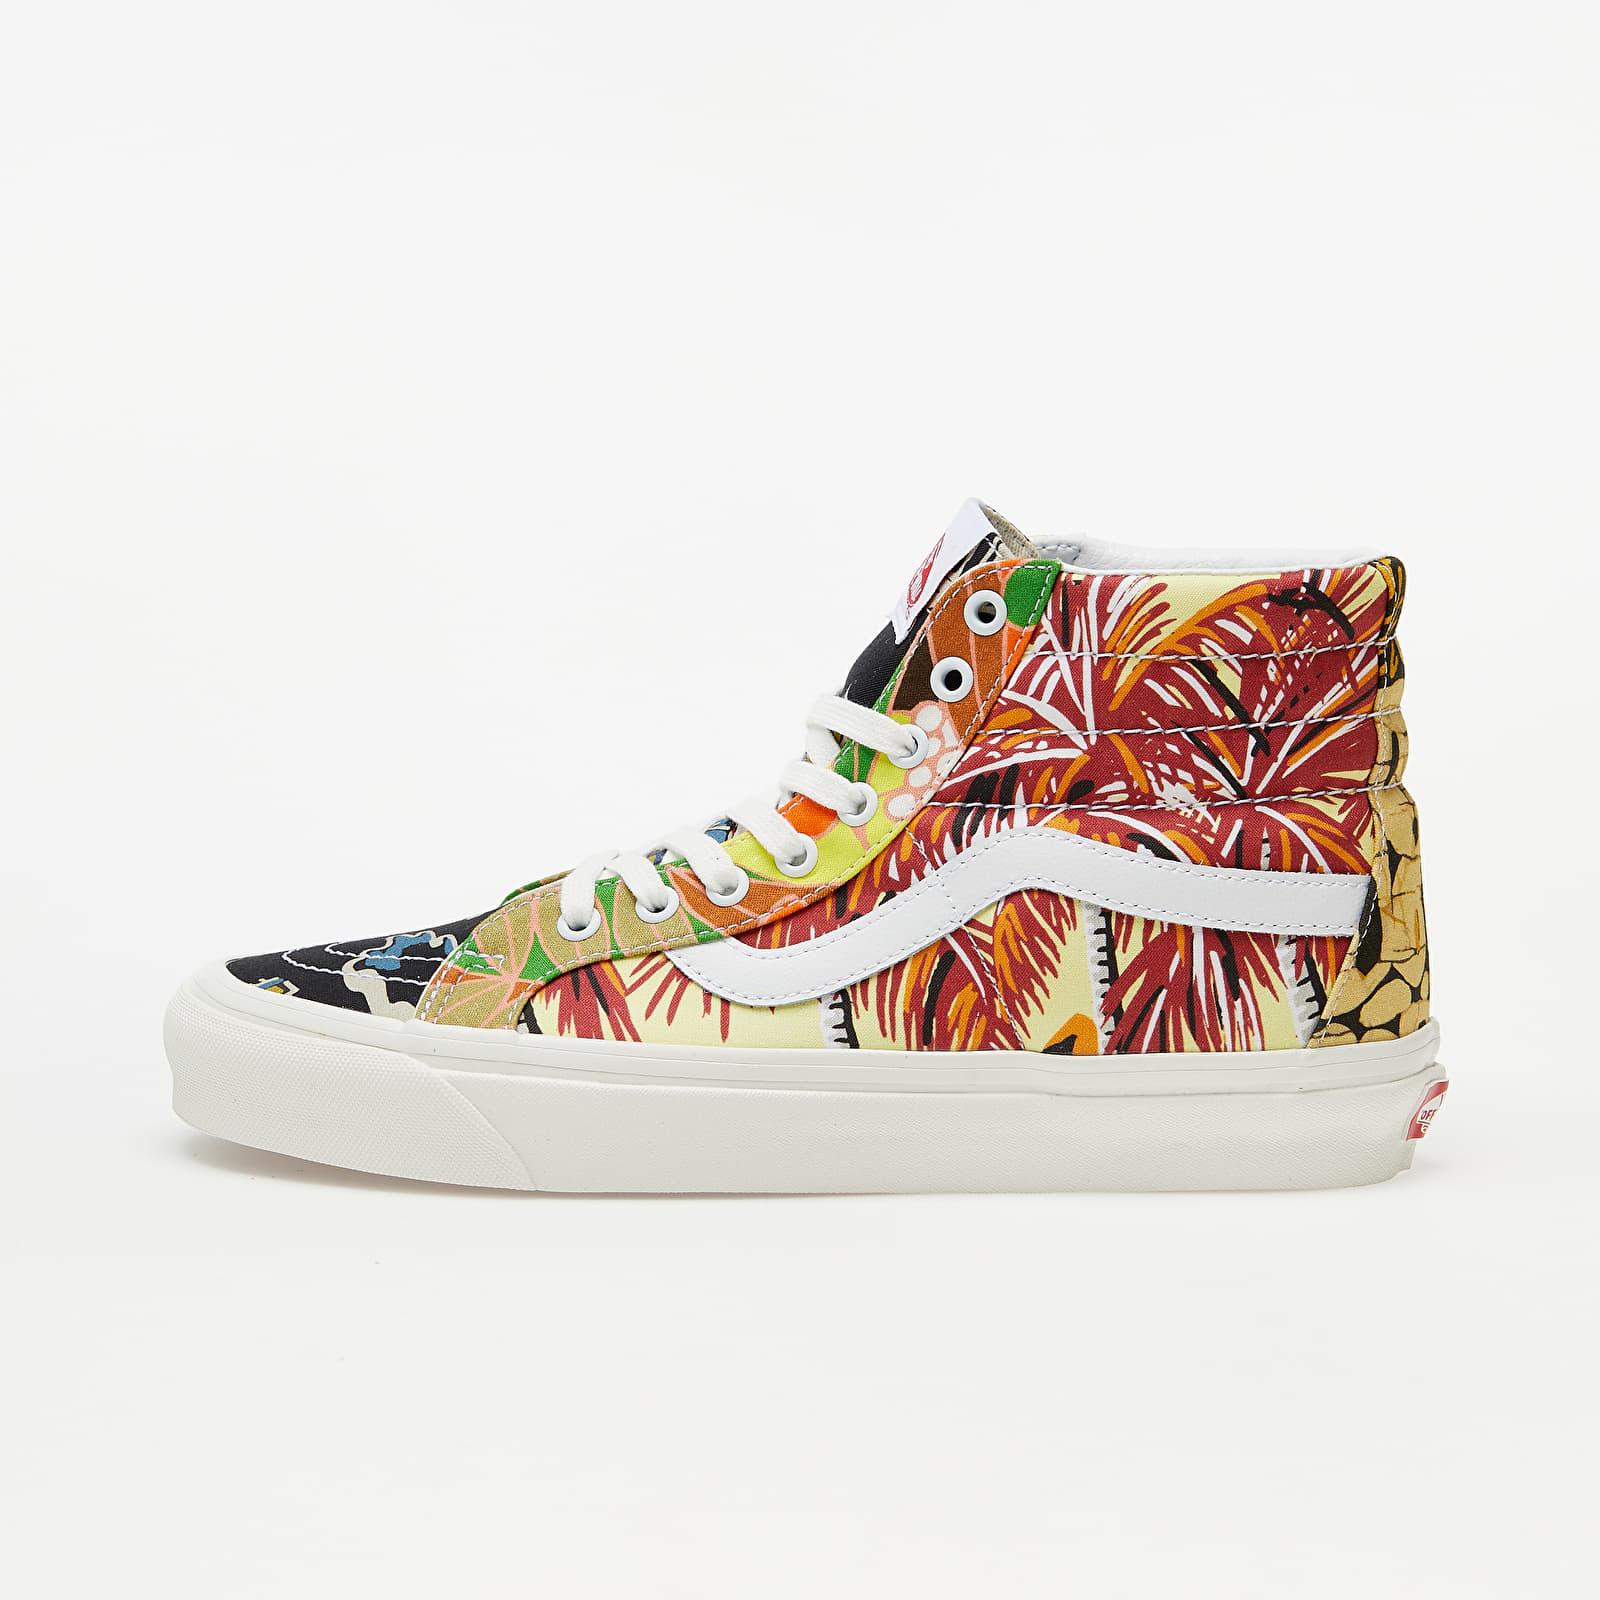 Férfi cipők Vans Sk8-Hi 38 DX (Anaheim Factory) Hoffman Fabrics/ Native Mix